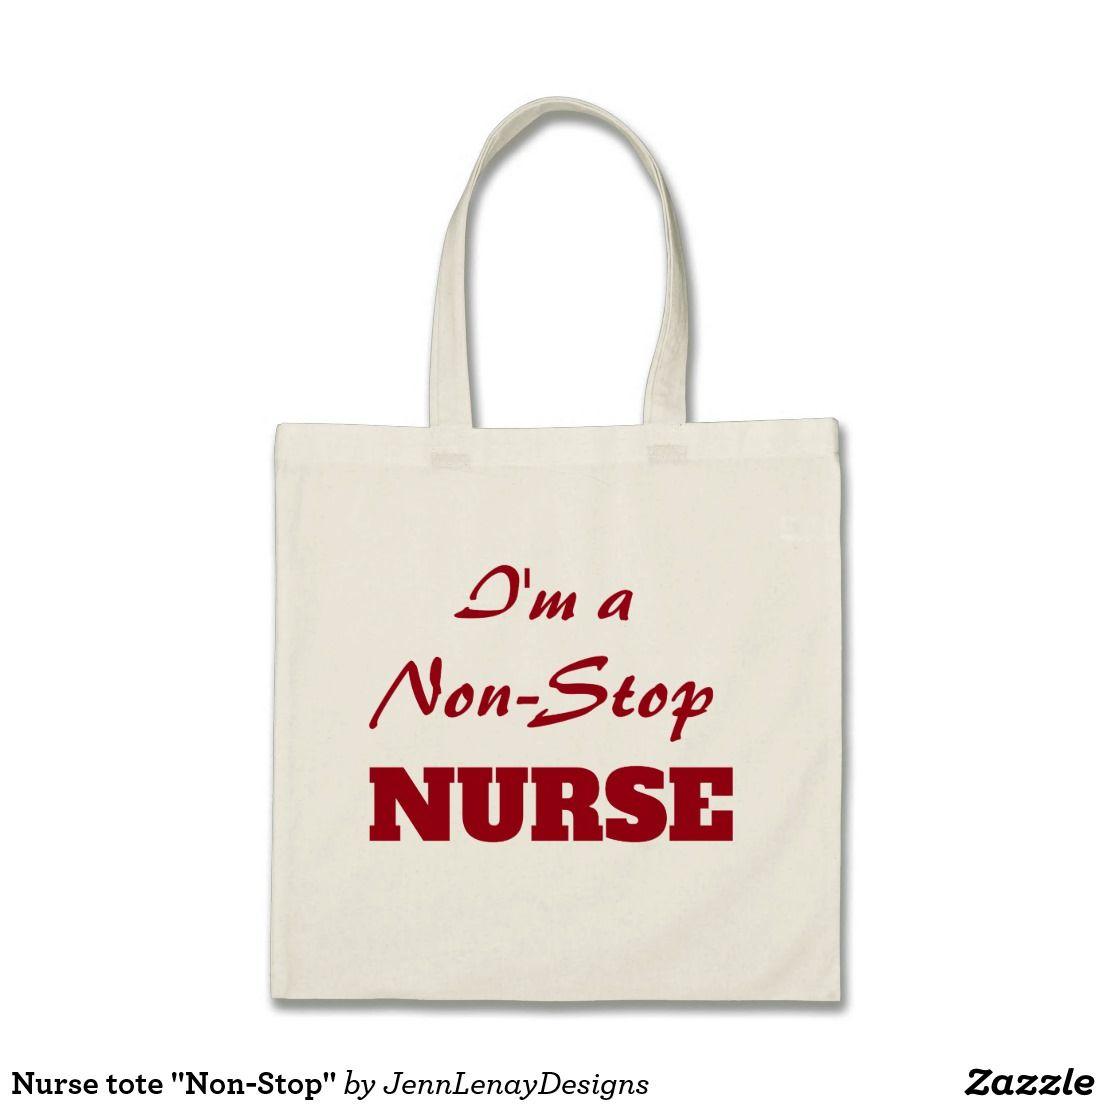 Funny Nurses Non Stop Nurse Tote Bag | Zazzle.com in 2020 ...